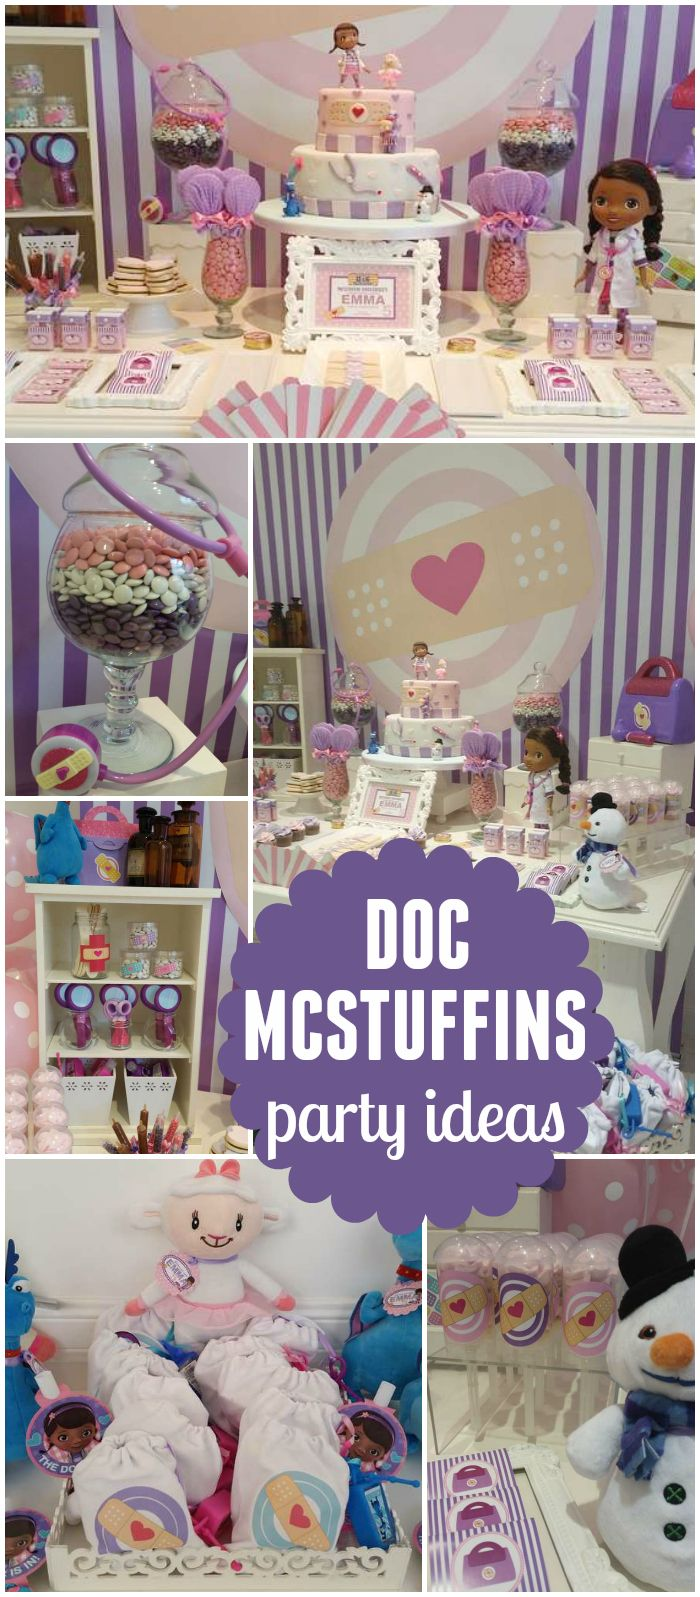 275 Best Doc Mcstuffins Images By Desiree Jenkins On Pinterest Doc